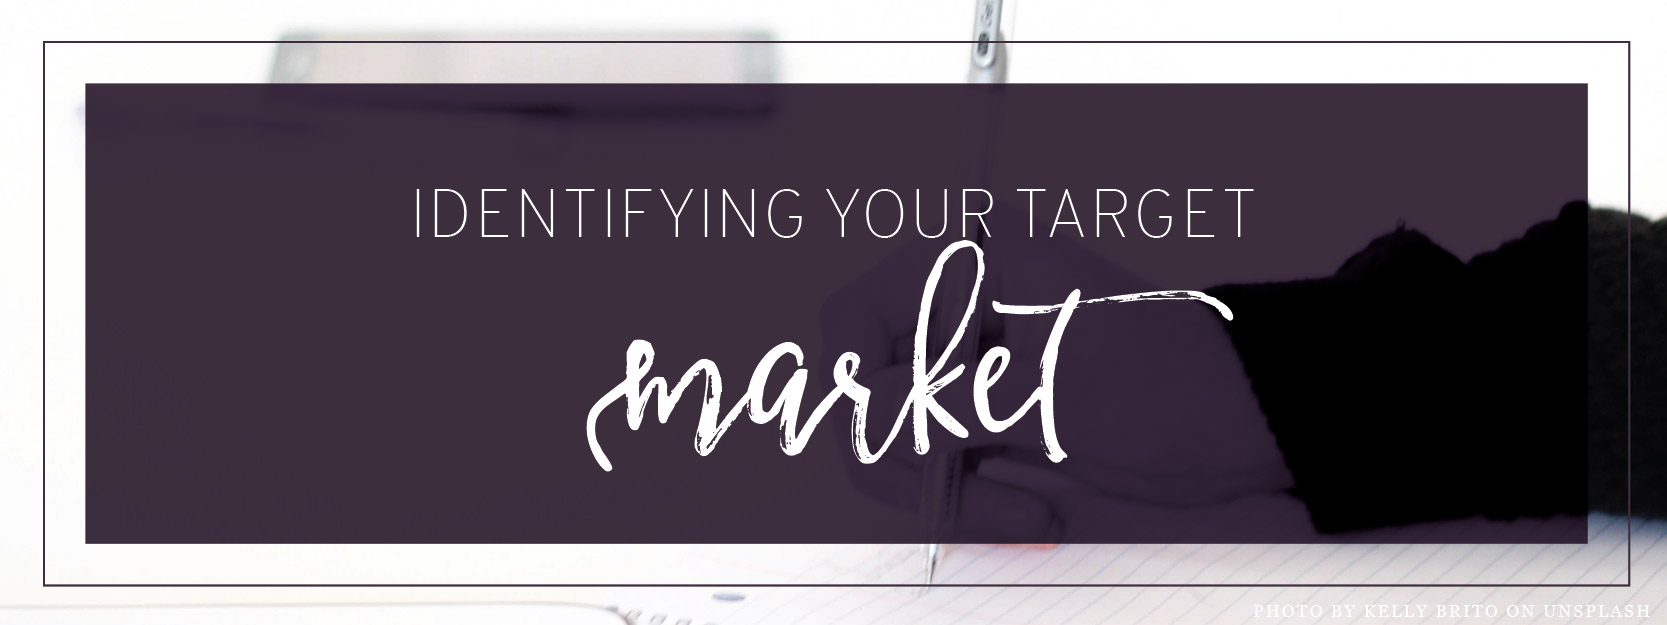 Identifying Your Target Market Header